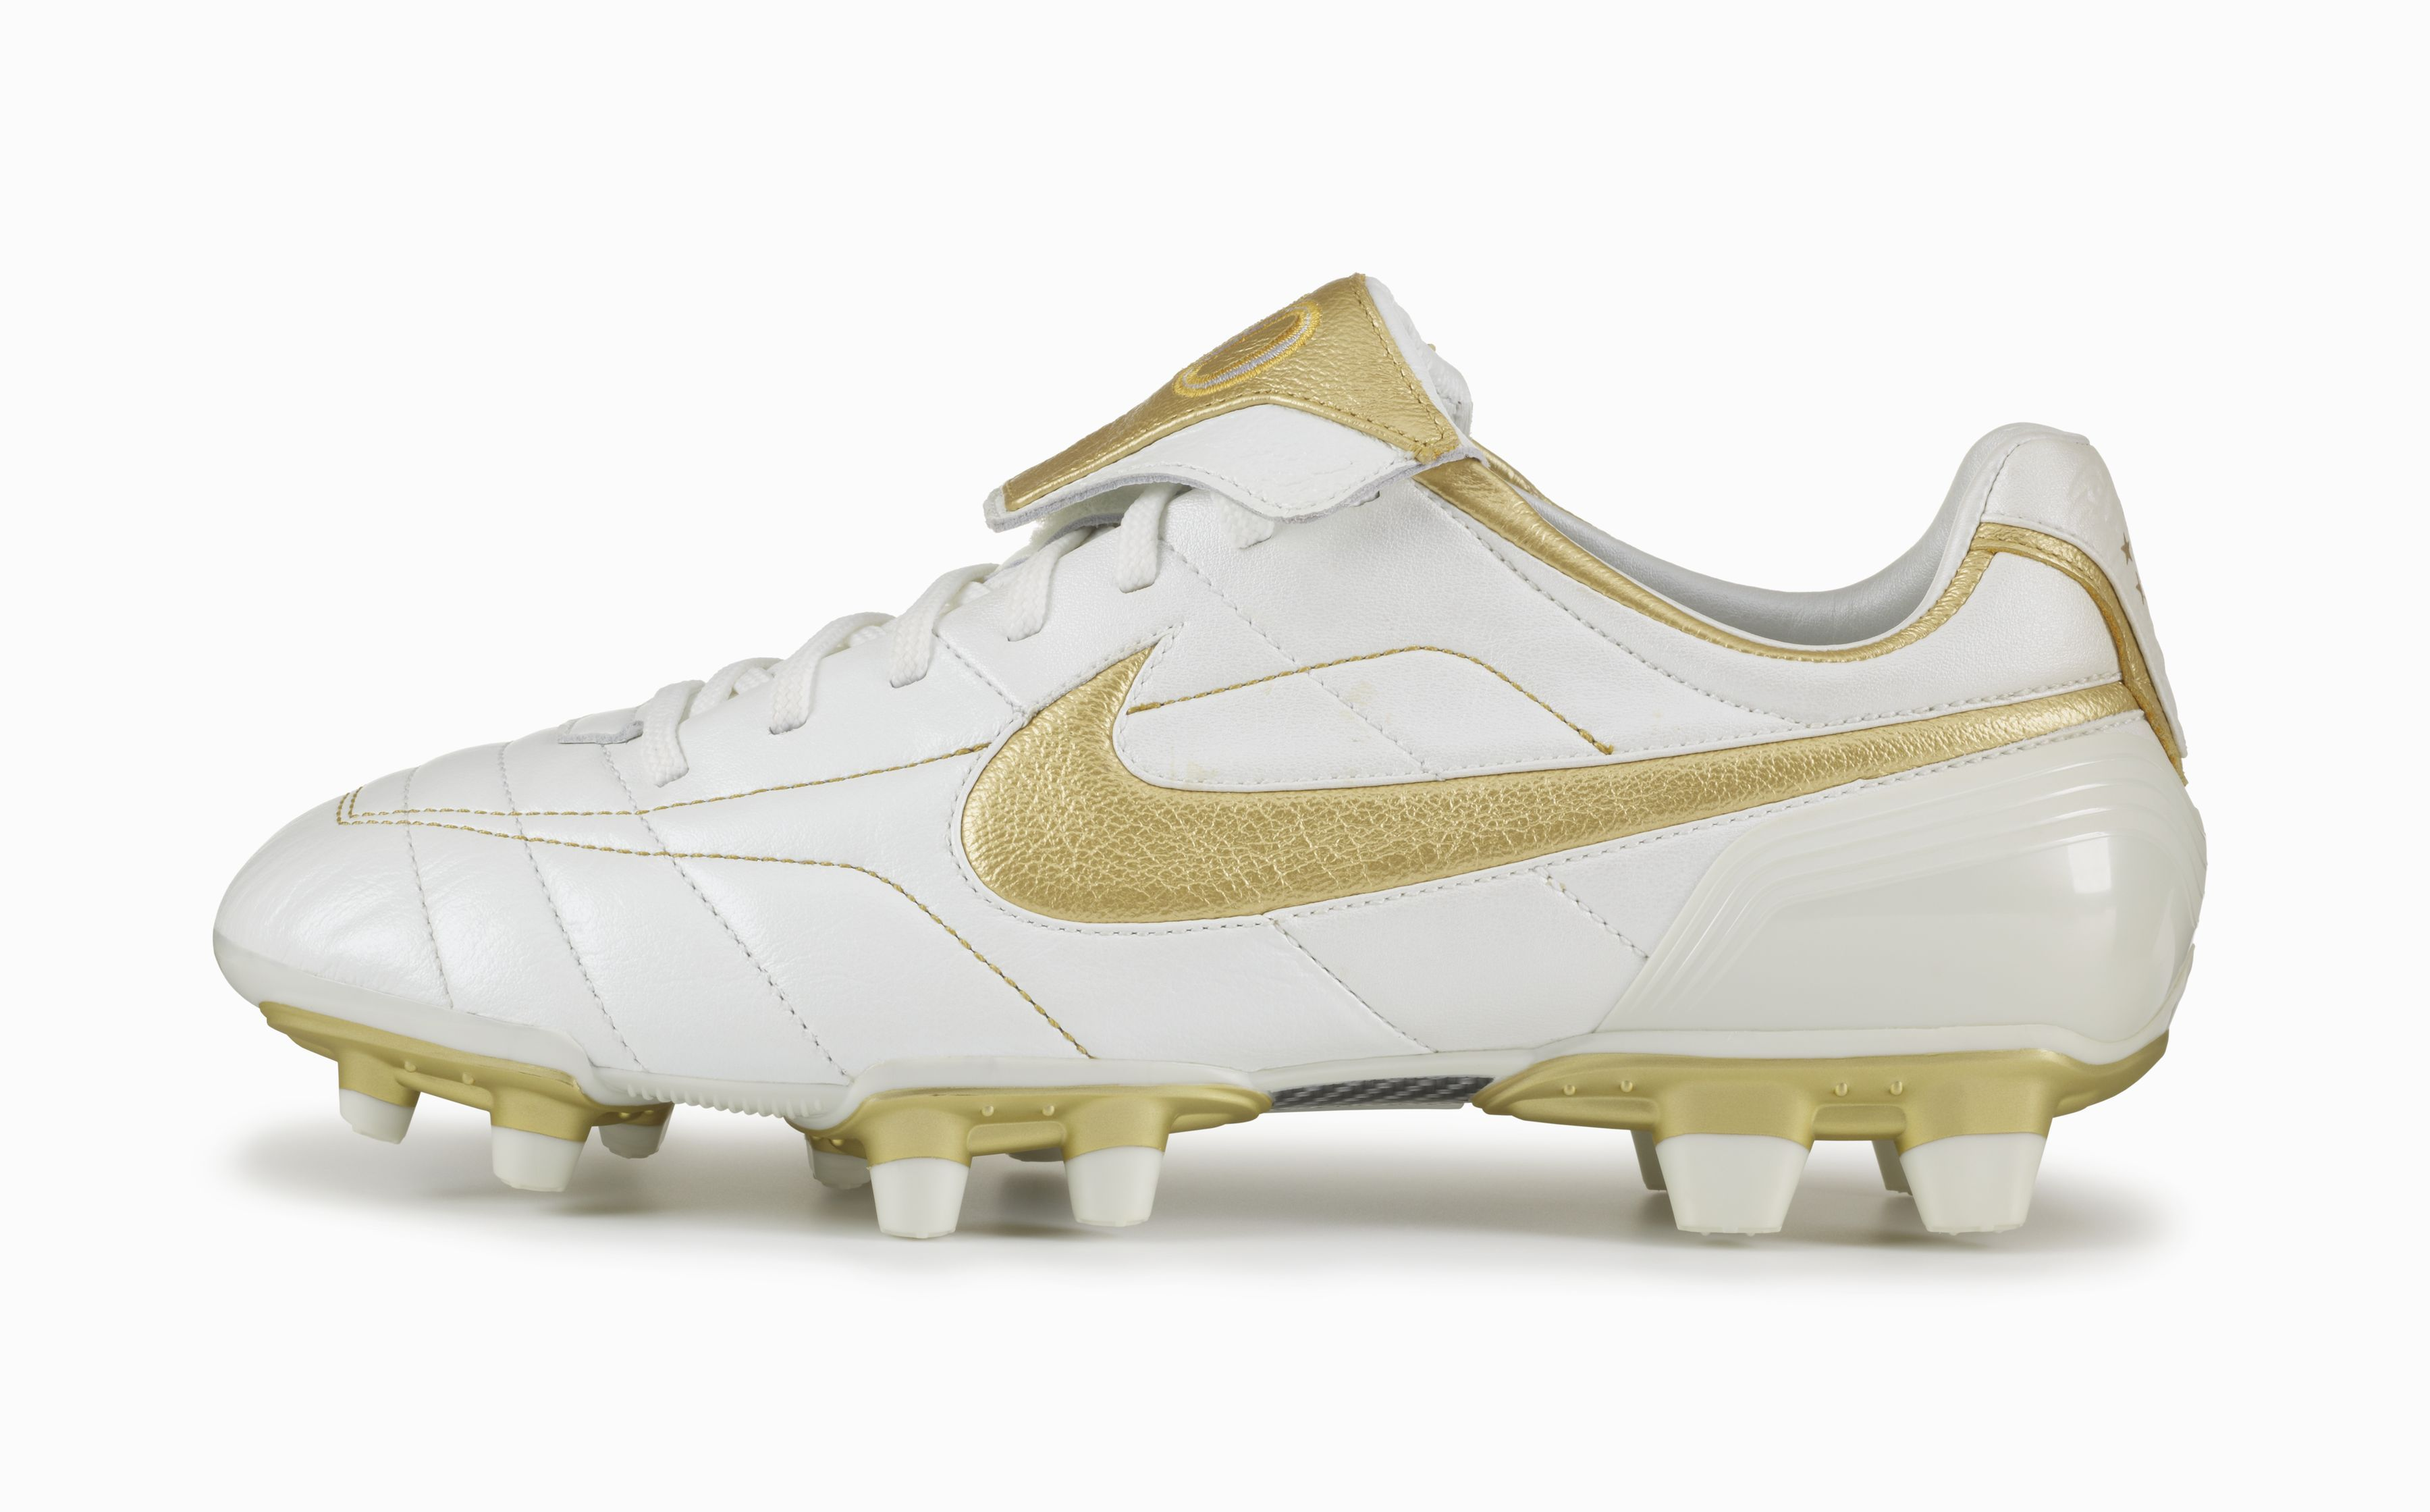 separation shoes 55ca9 63274 nike tiempo legend 2 - Google Search